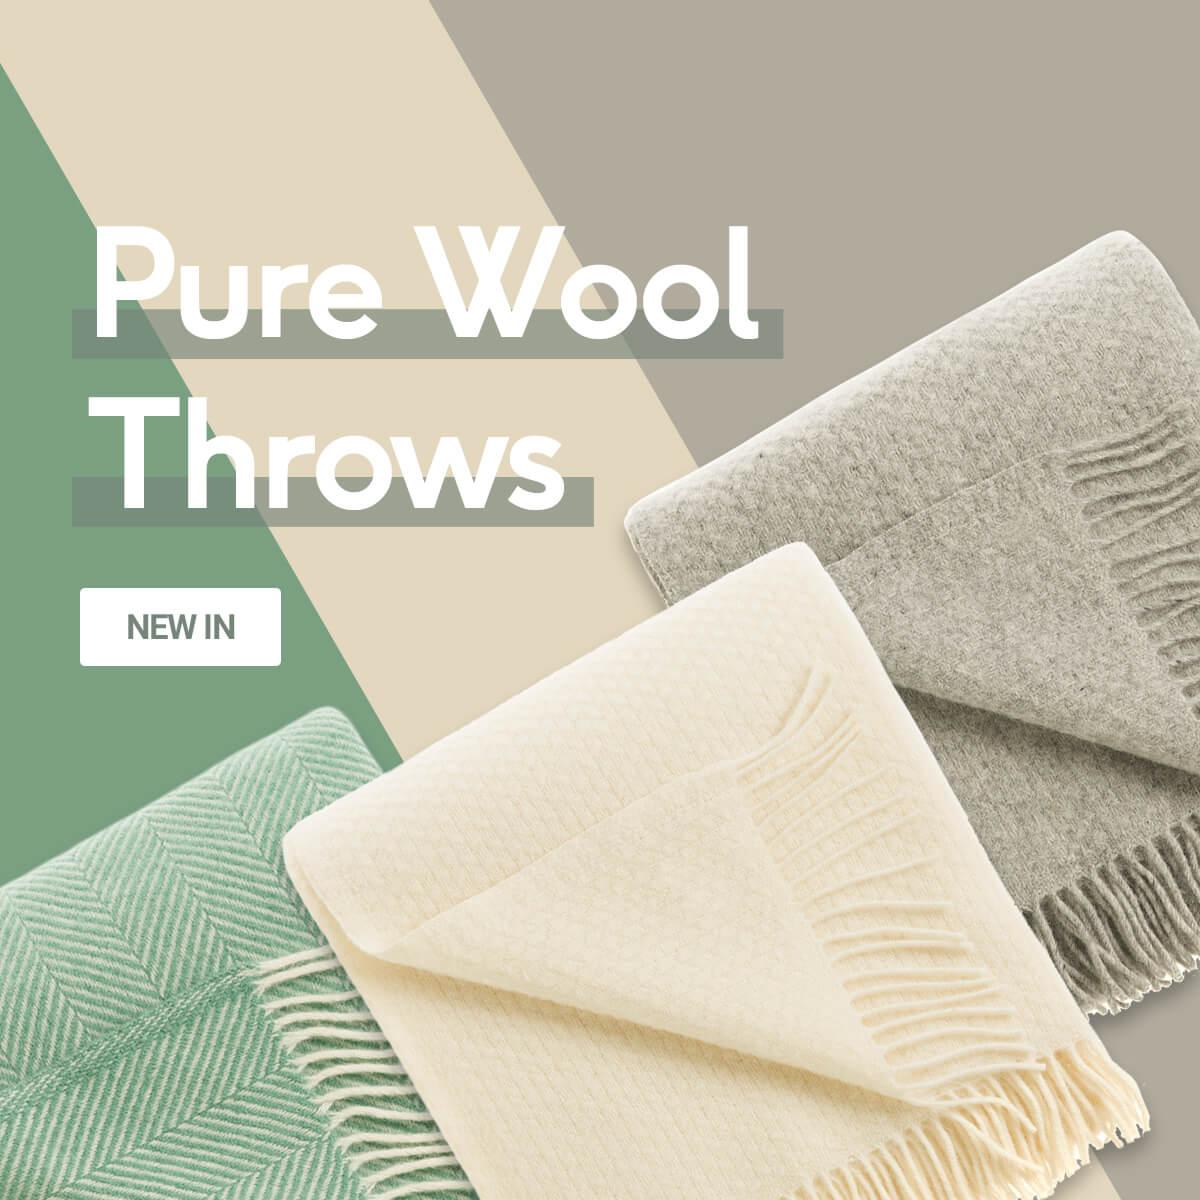 Pure Wool Thorws - Coming Soon